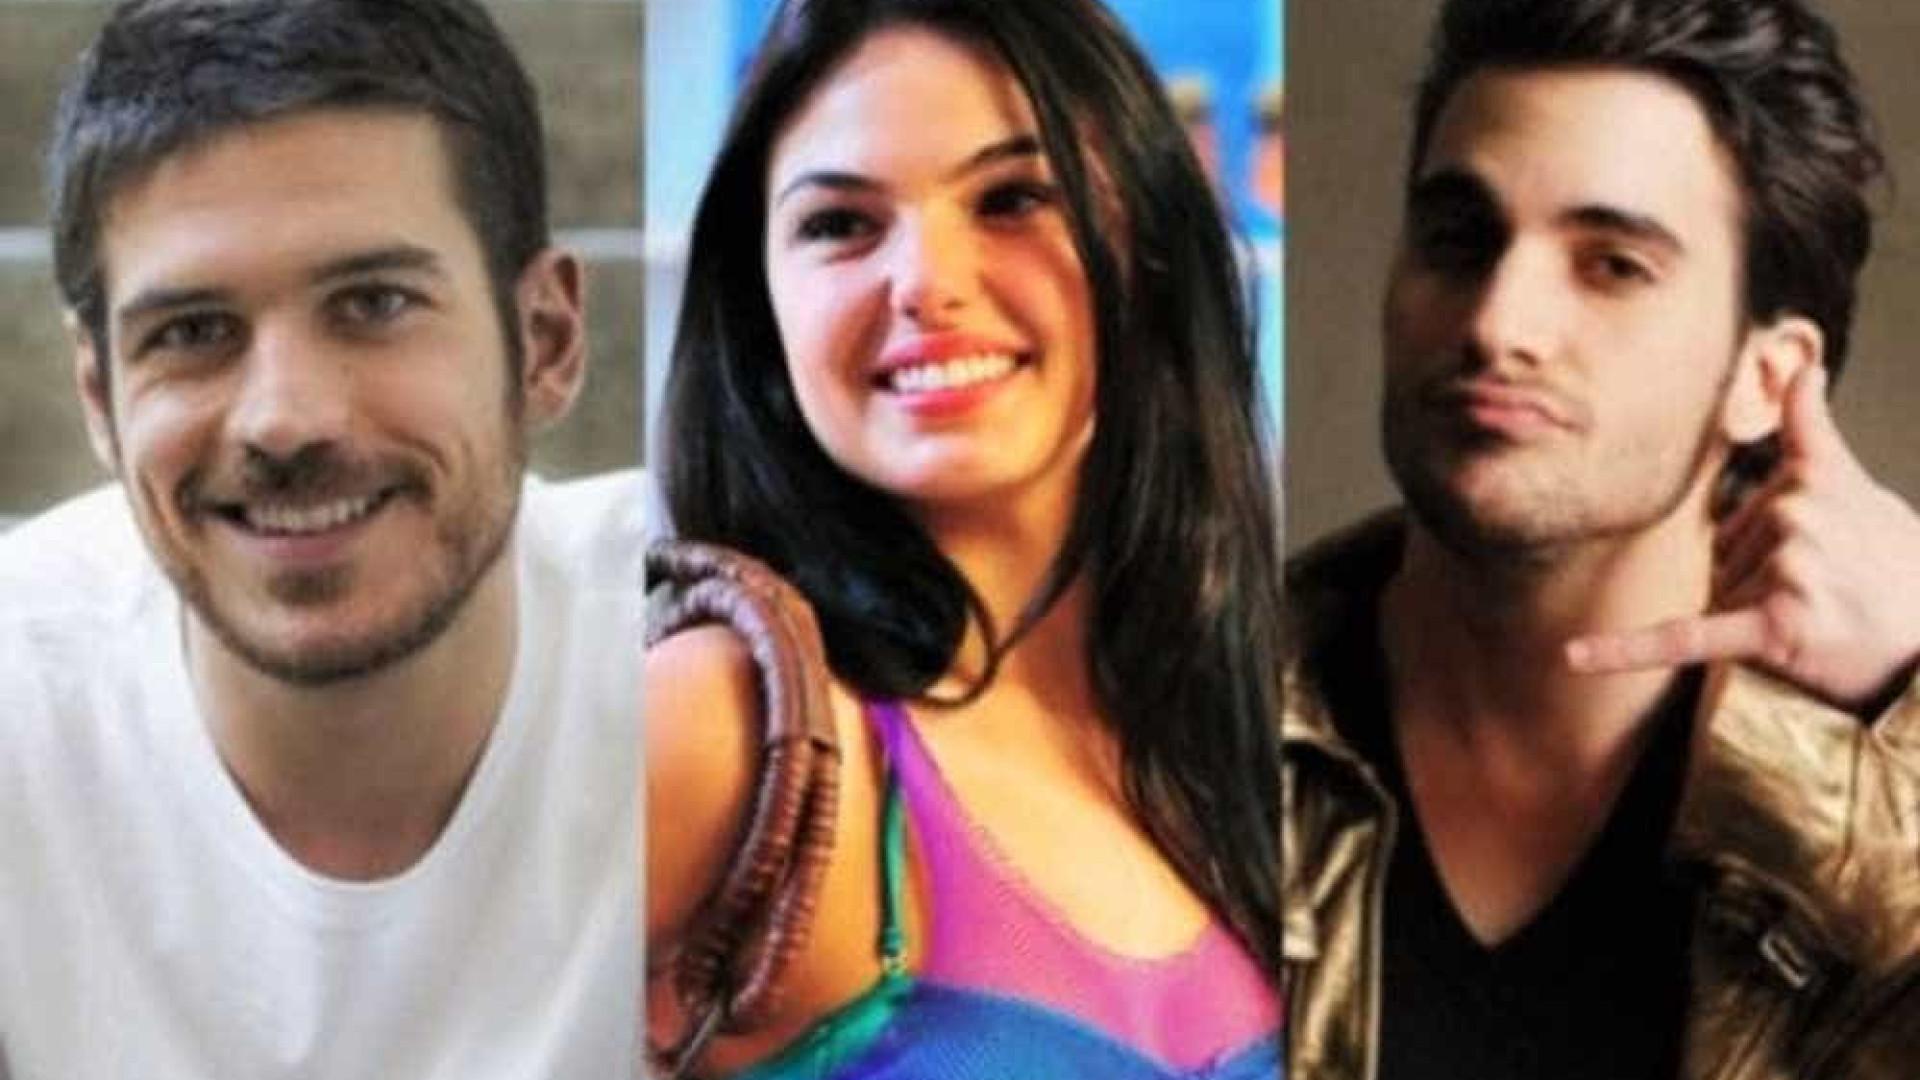 Fiuk formará triângulo amoroso com Isis Valverde e Marco Pigossi